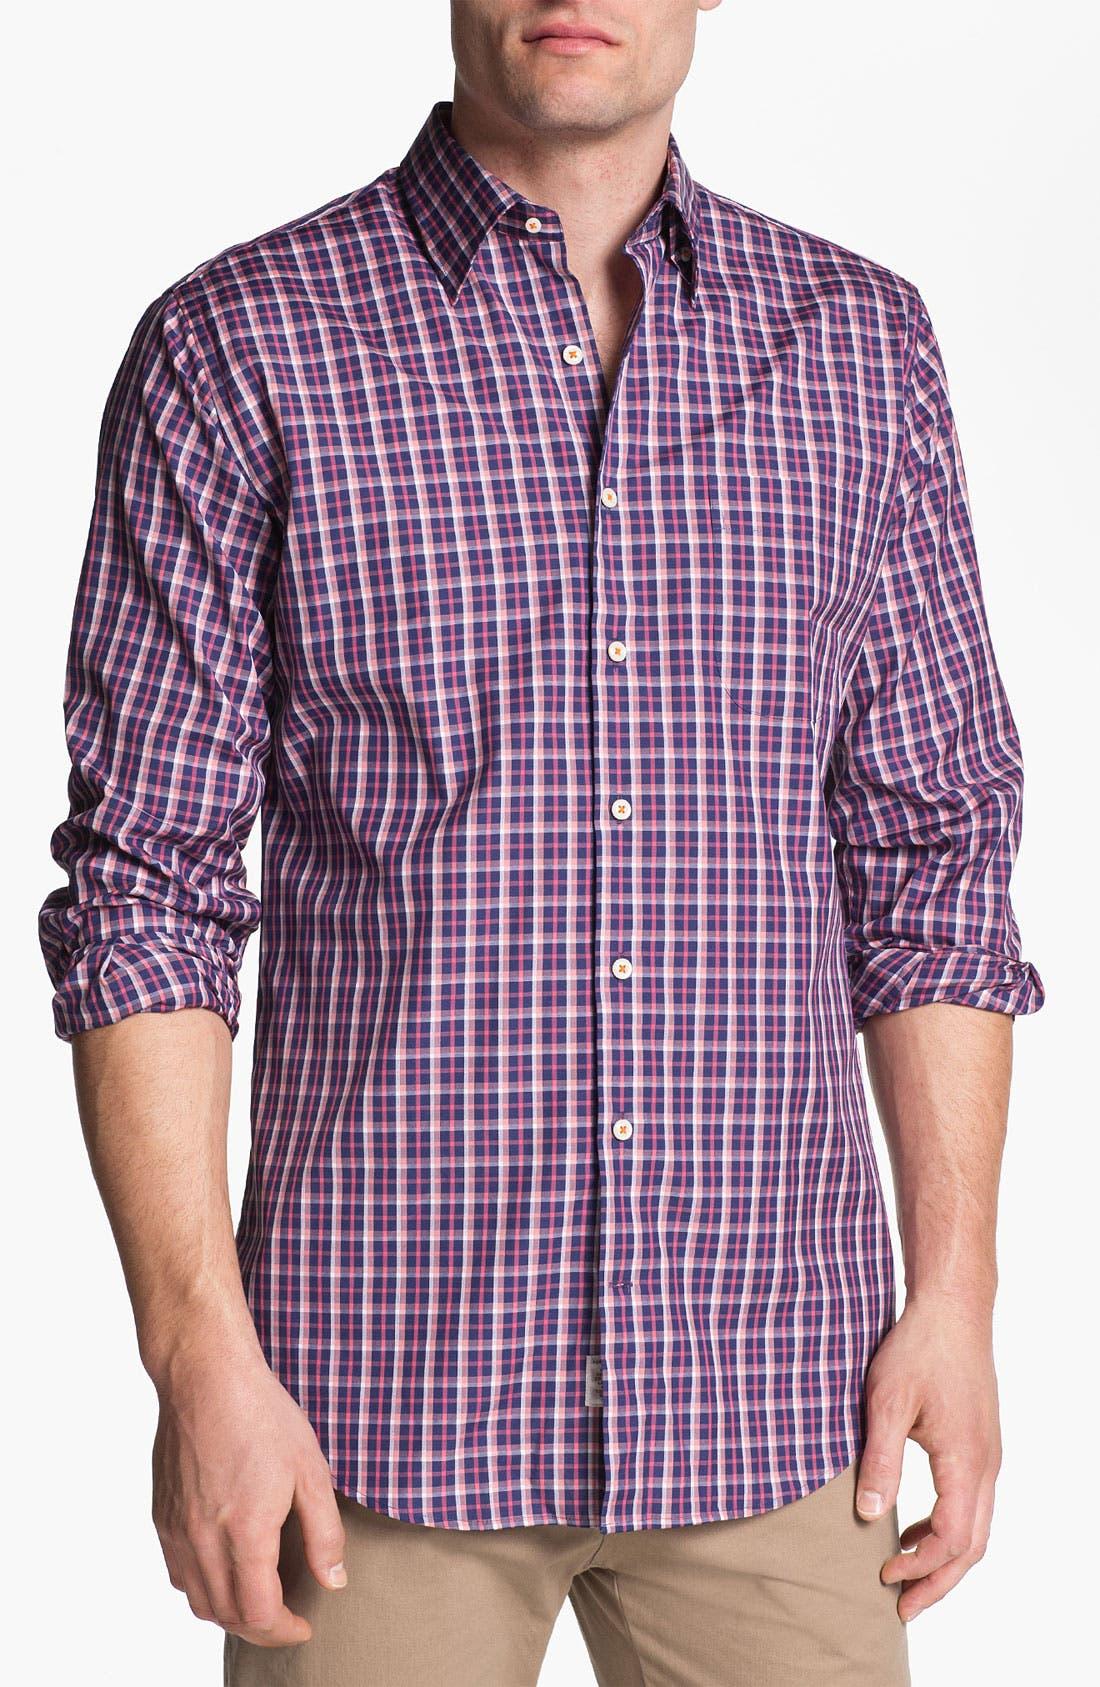 Alternate Image 1 Selected - Peter Millar 'Amsterdam' Regular Fit Plaid Sport Shirt